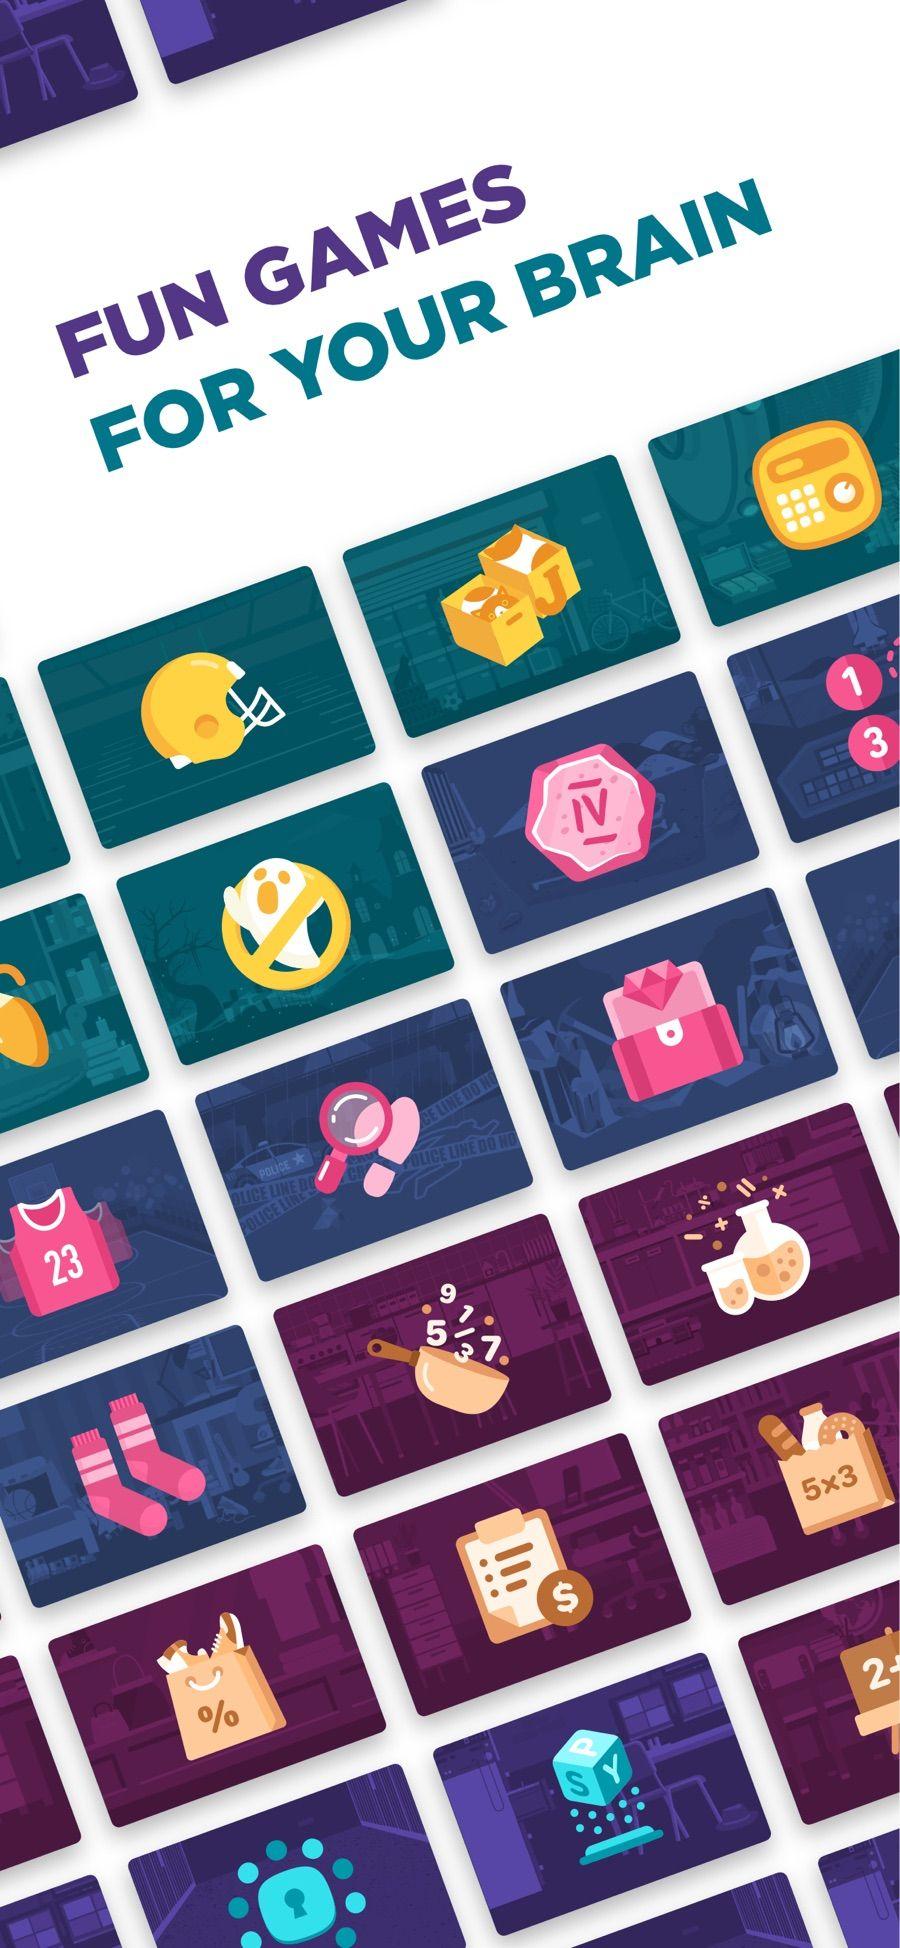 Impulse Brain Training Games on the App Store in 2020